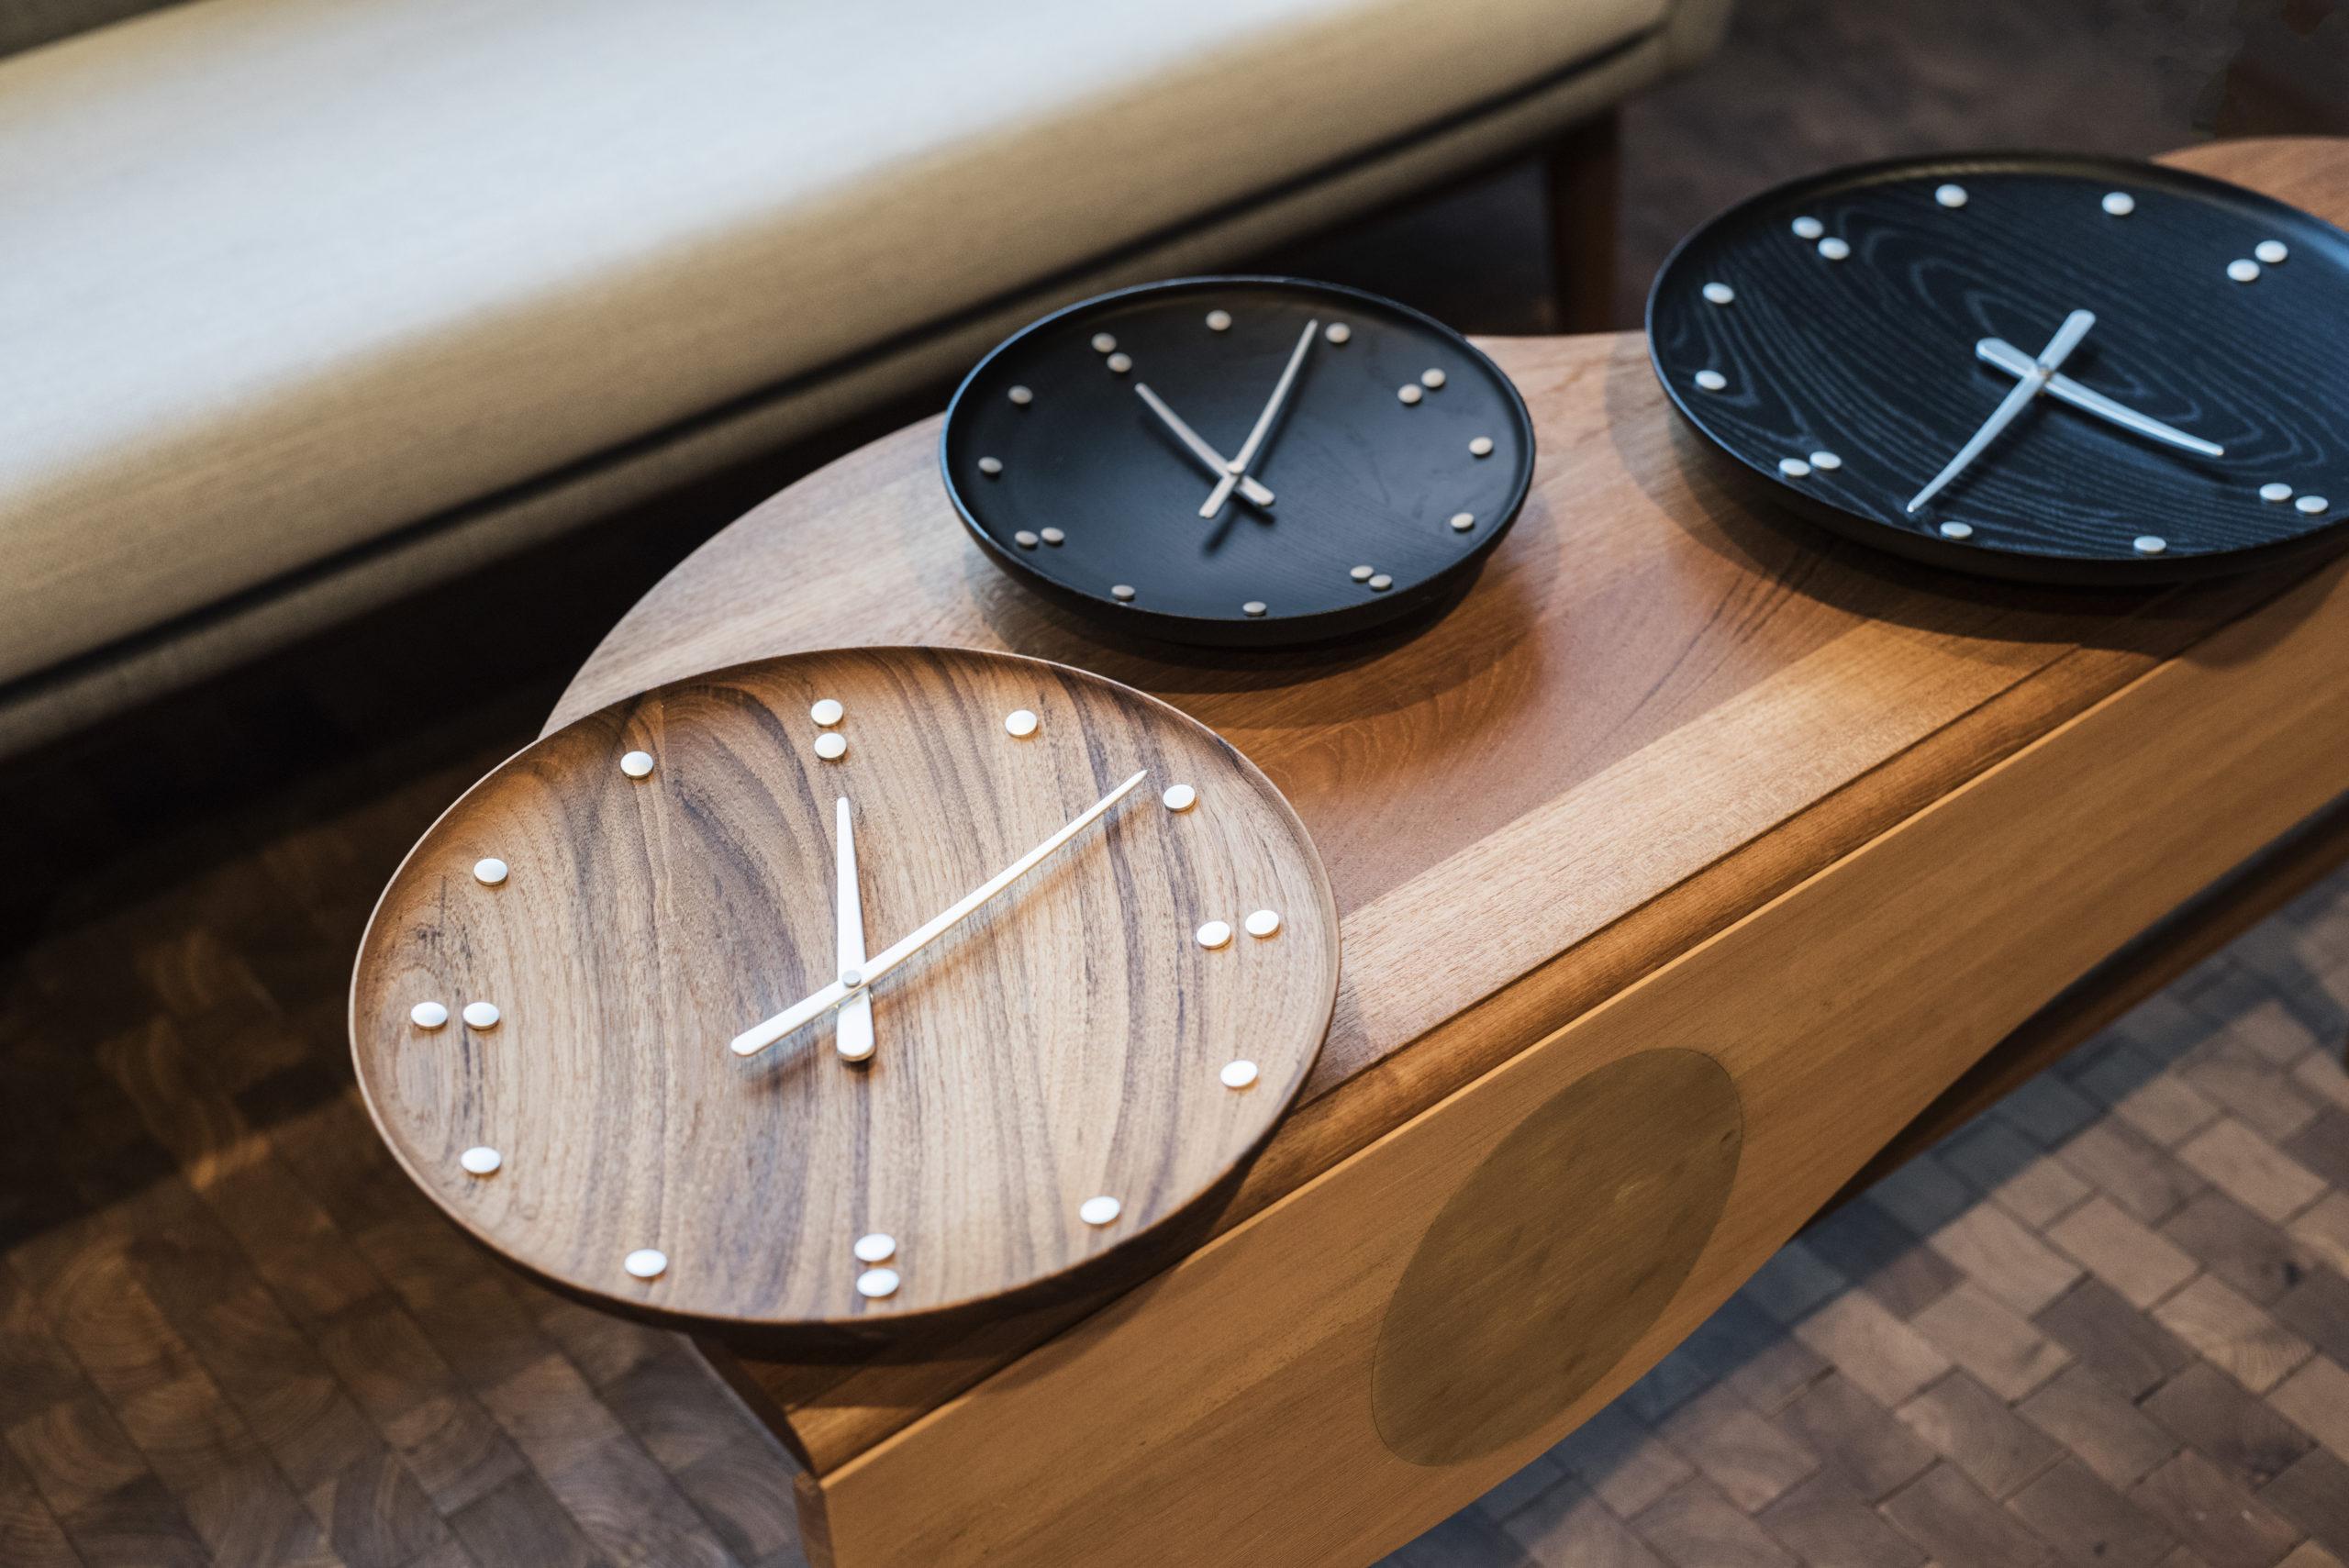 Architectmade-FJ-Clock-Wall-Clock-Teak-and-Ash-Wood-Denmark-Finn-Juhl-4